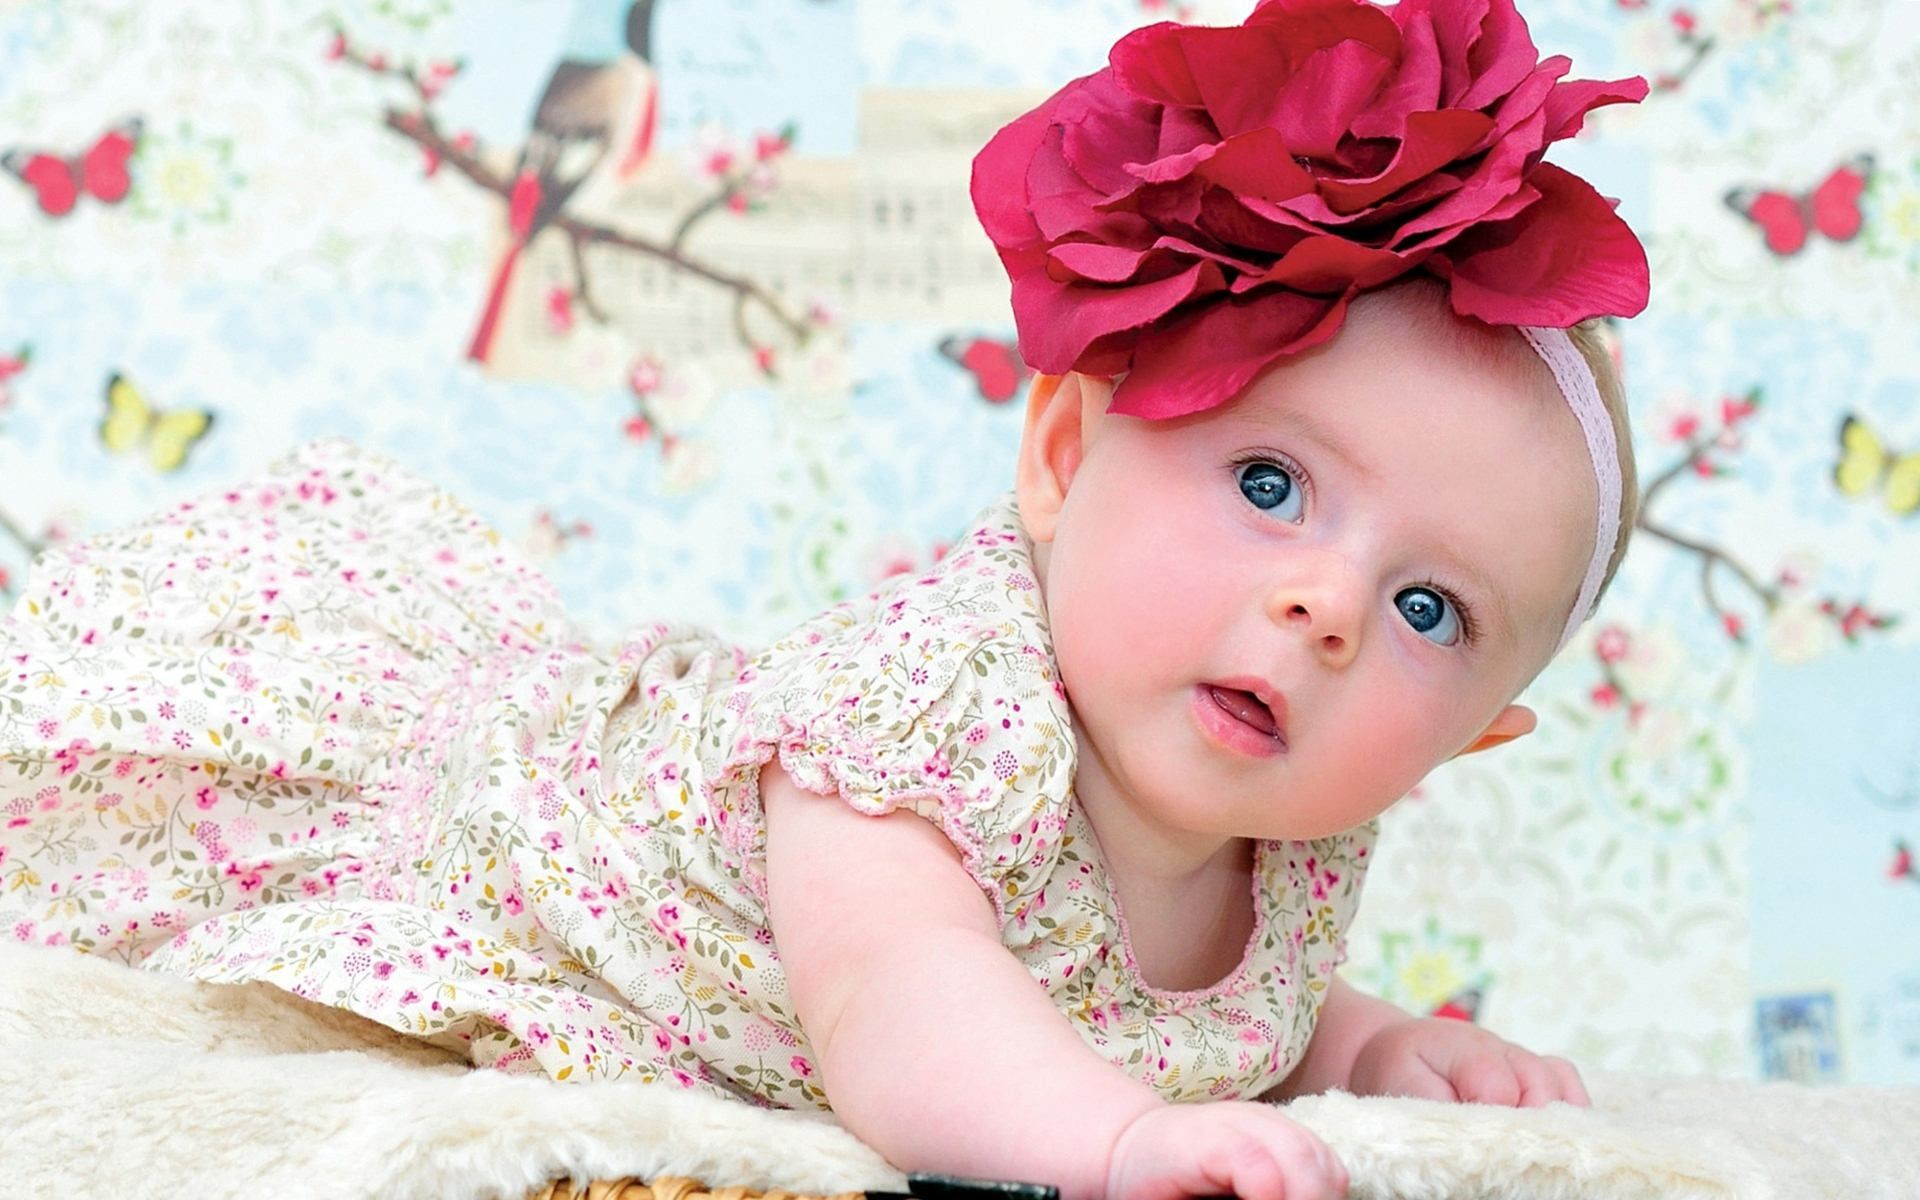 baby girl wallpaper hd photo download